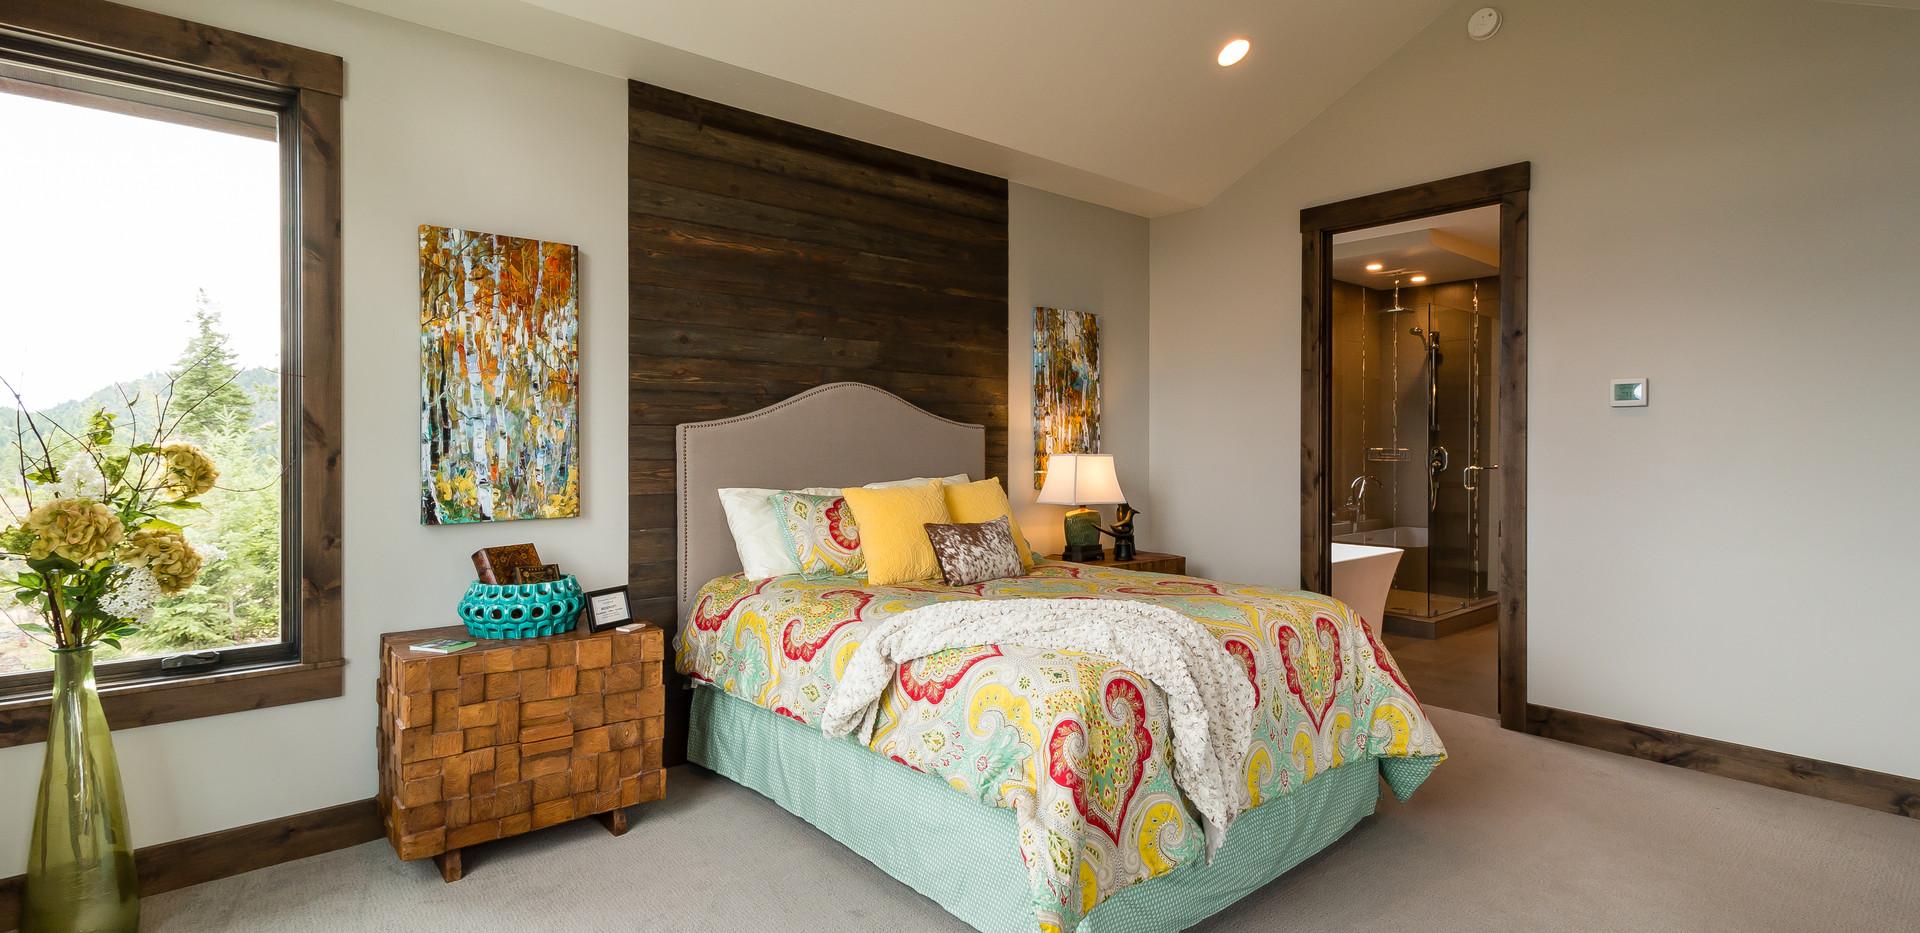 Mission Master Bedroom